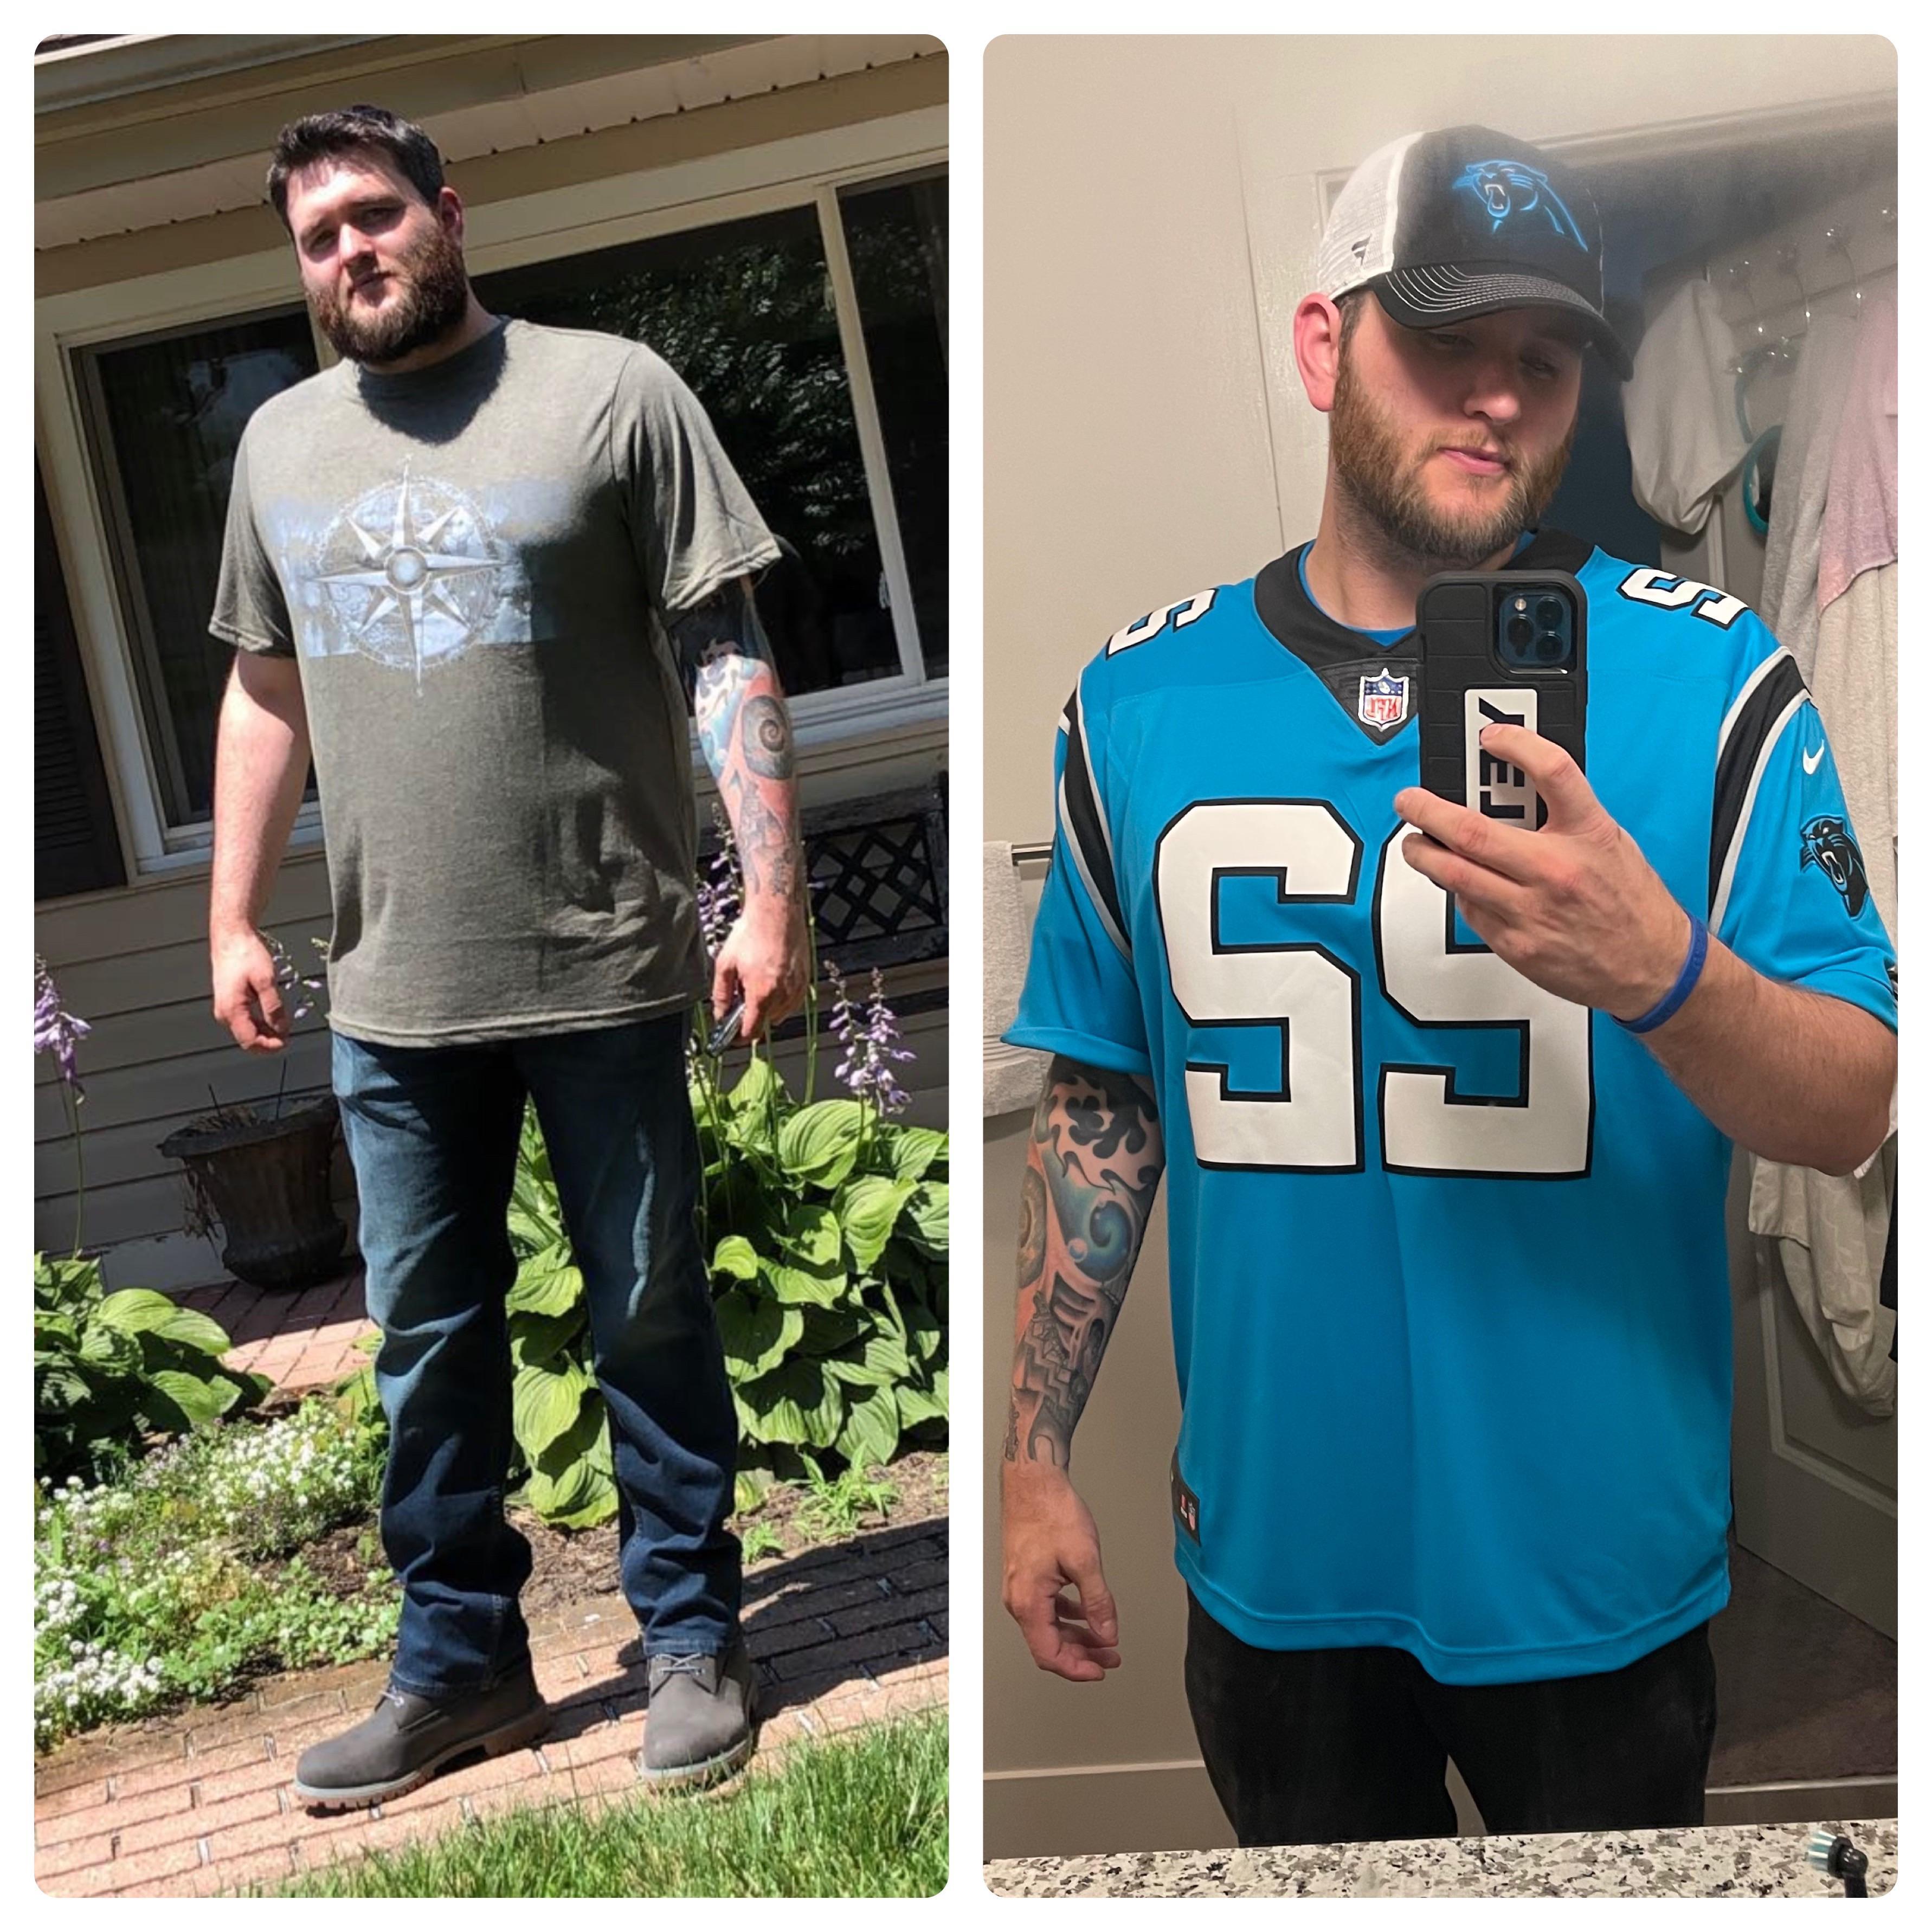 Progress Pics of 35 lbs Weight Loss 6 feet 2 Male 260 lbs to 225 lbs